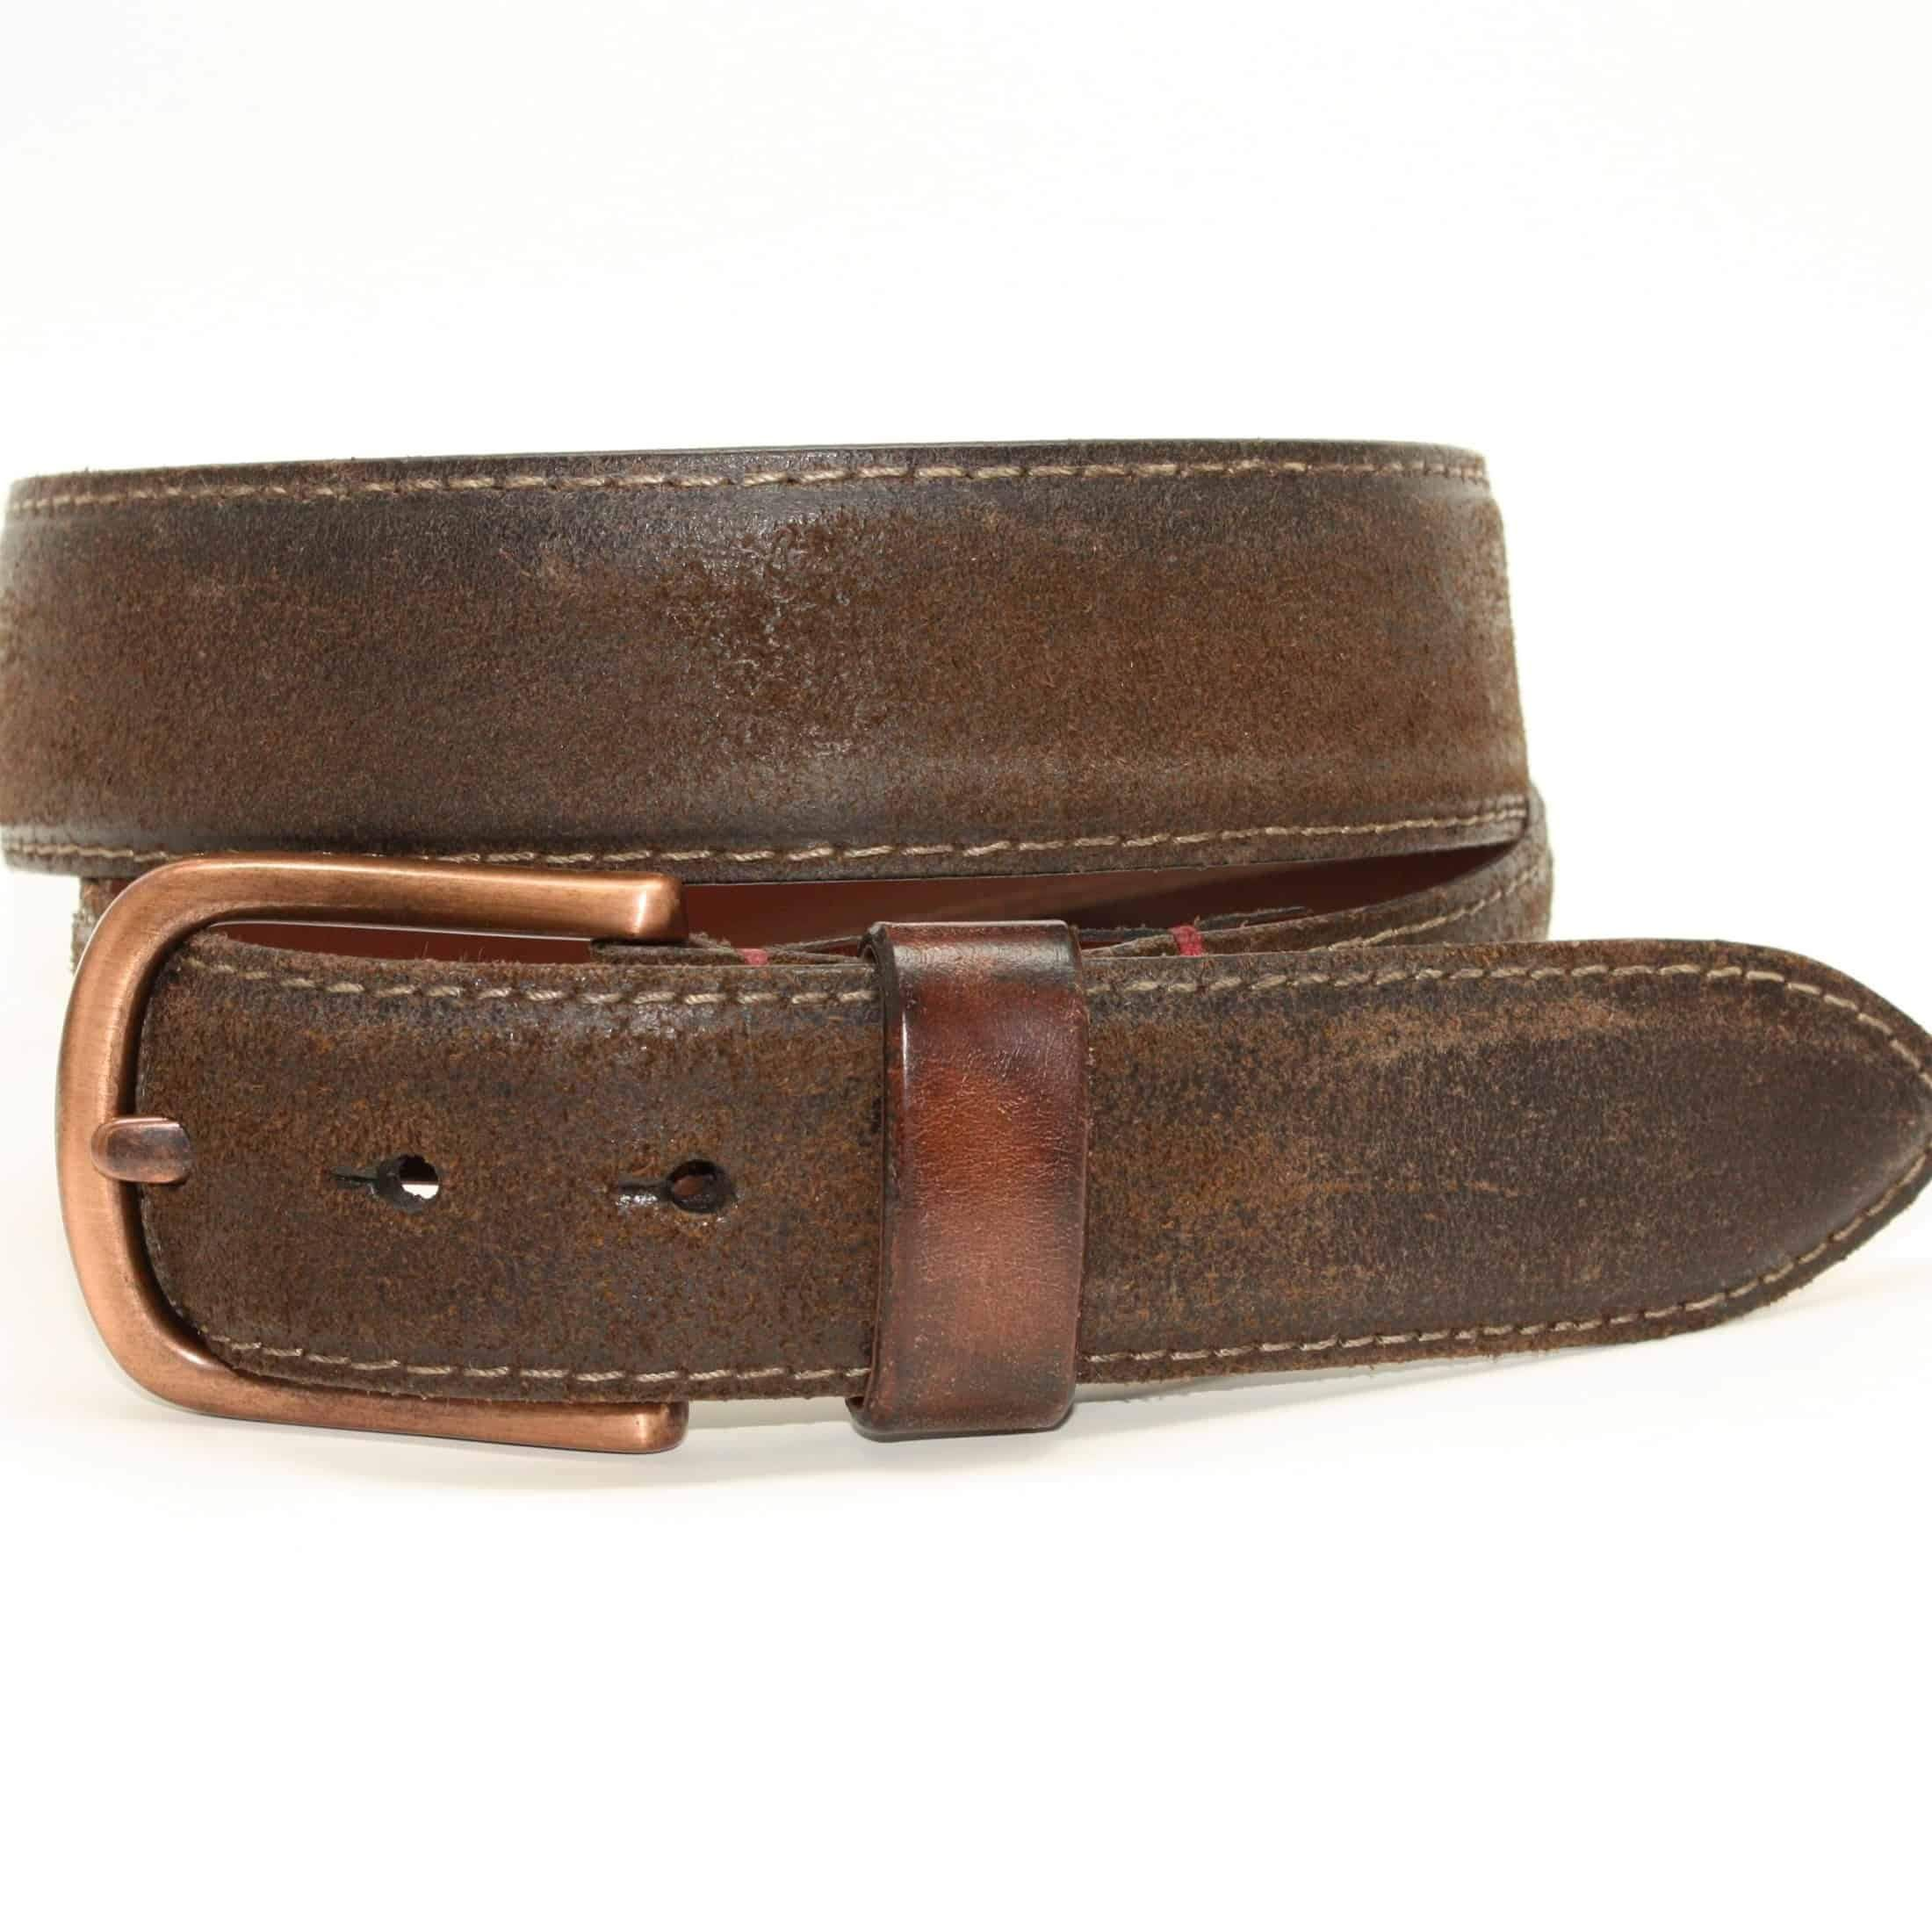 Torino' Sanded Harness Leather Belt | Belt, Leather company